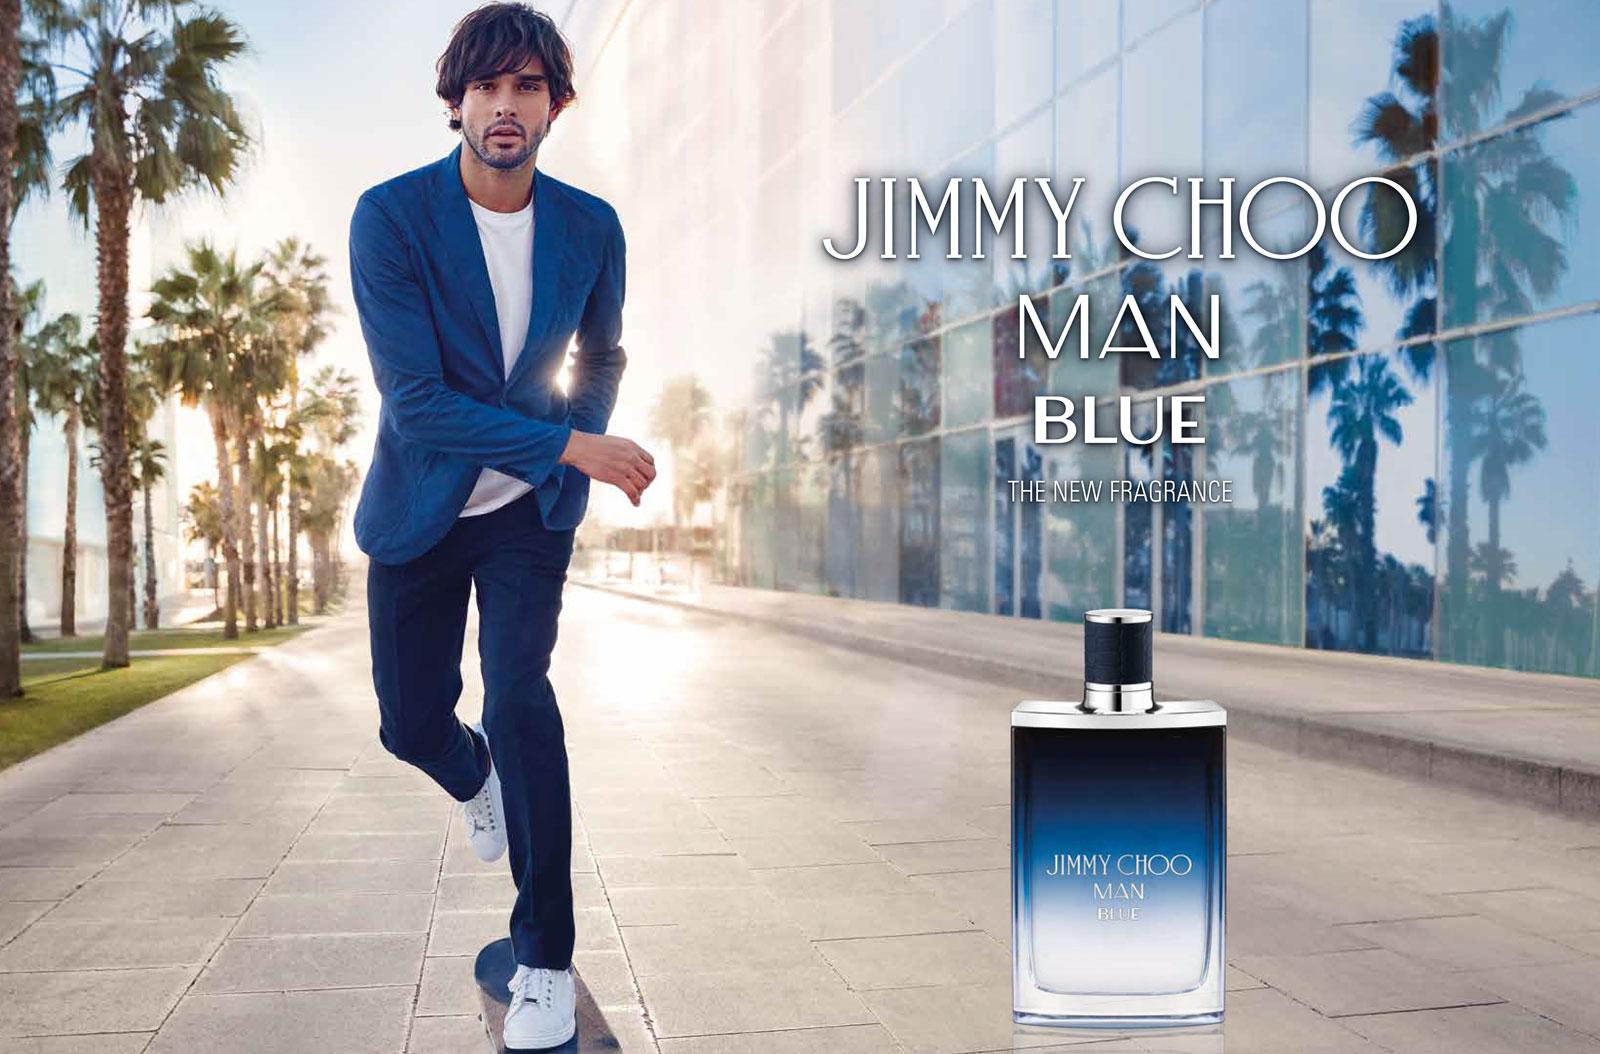 Jimmy Choo, fragrance, perfume, parfüm, man blue, Marlon Teixeira